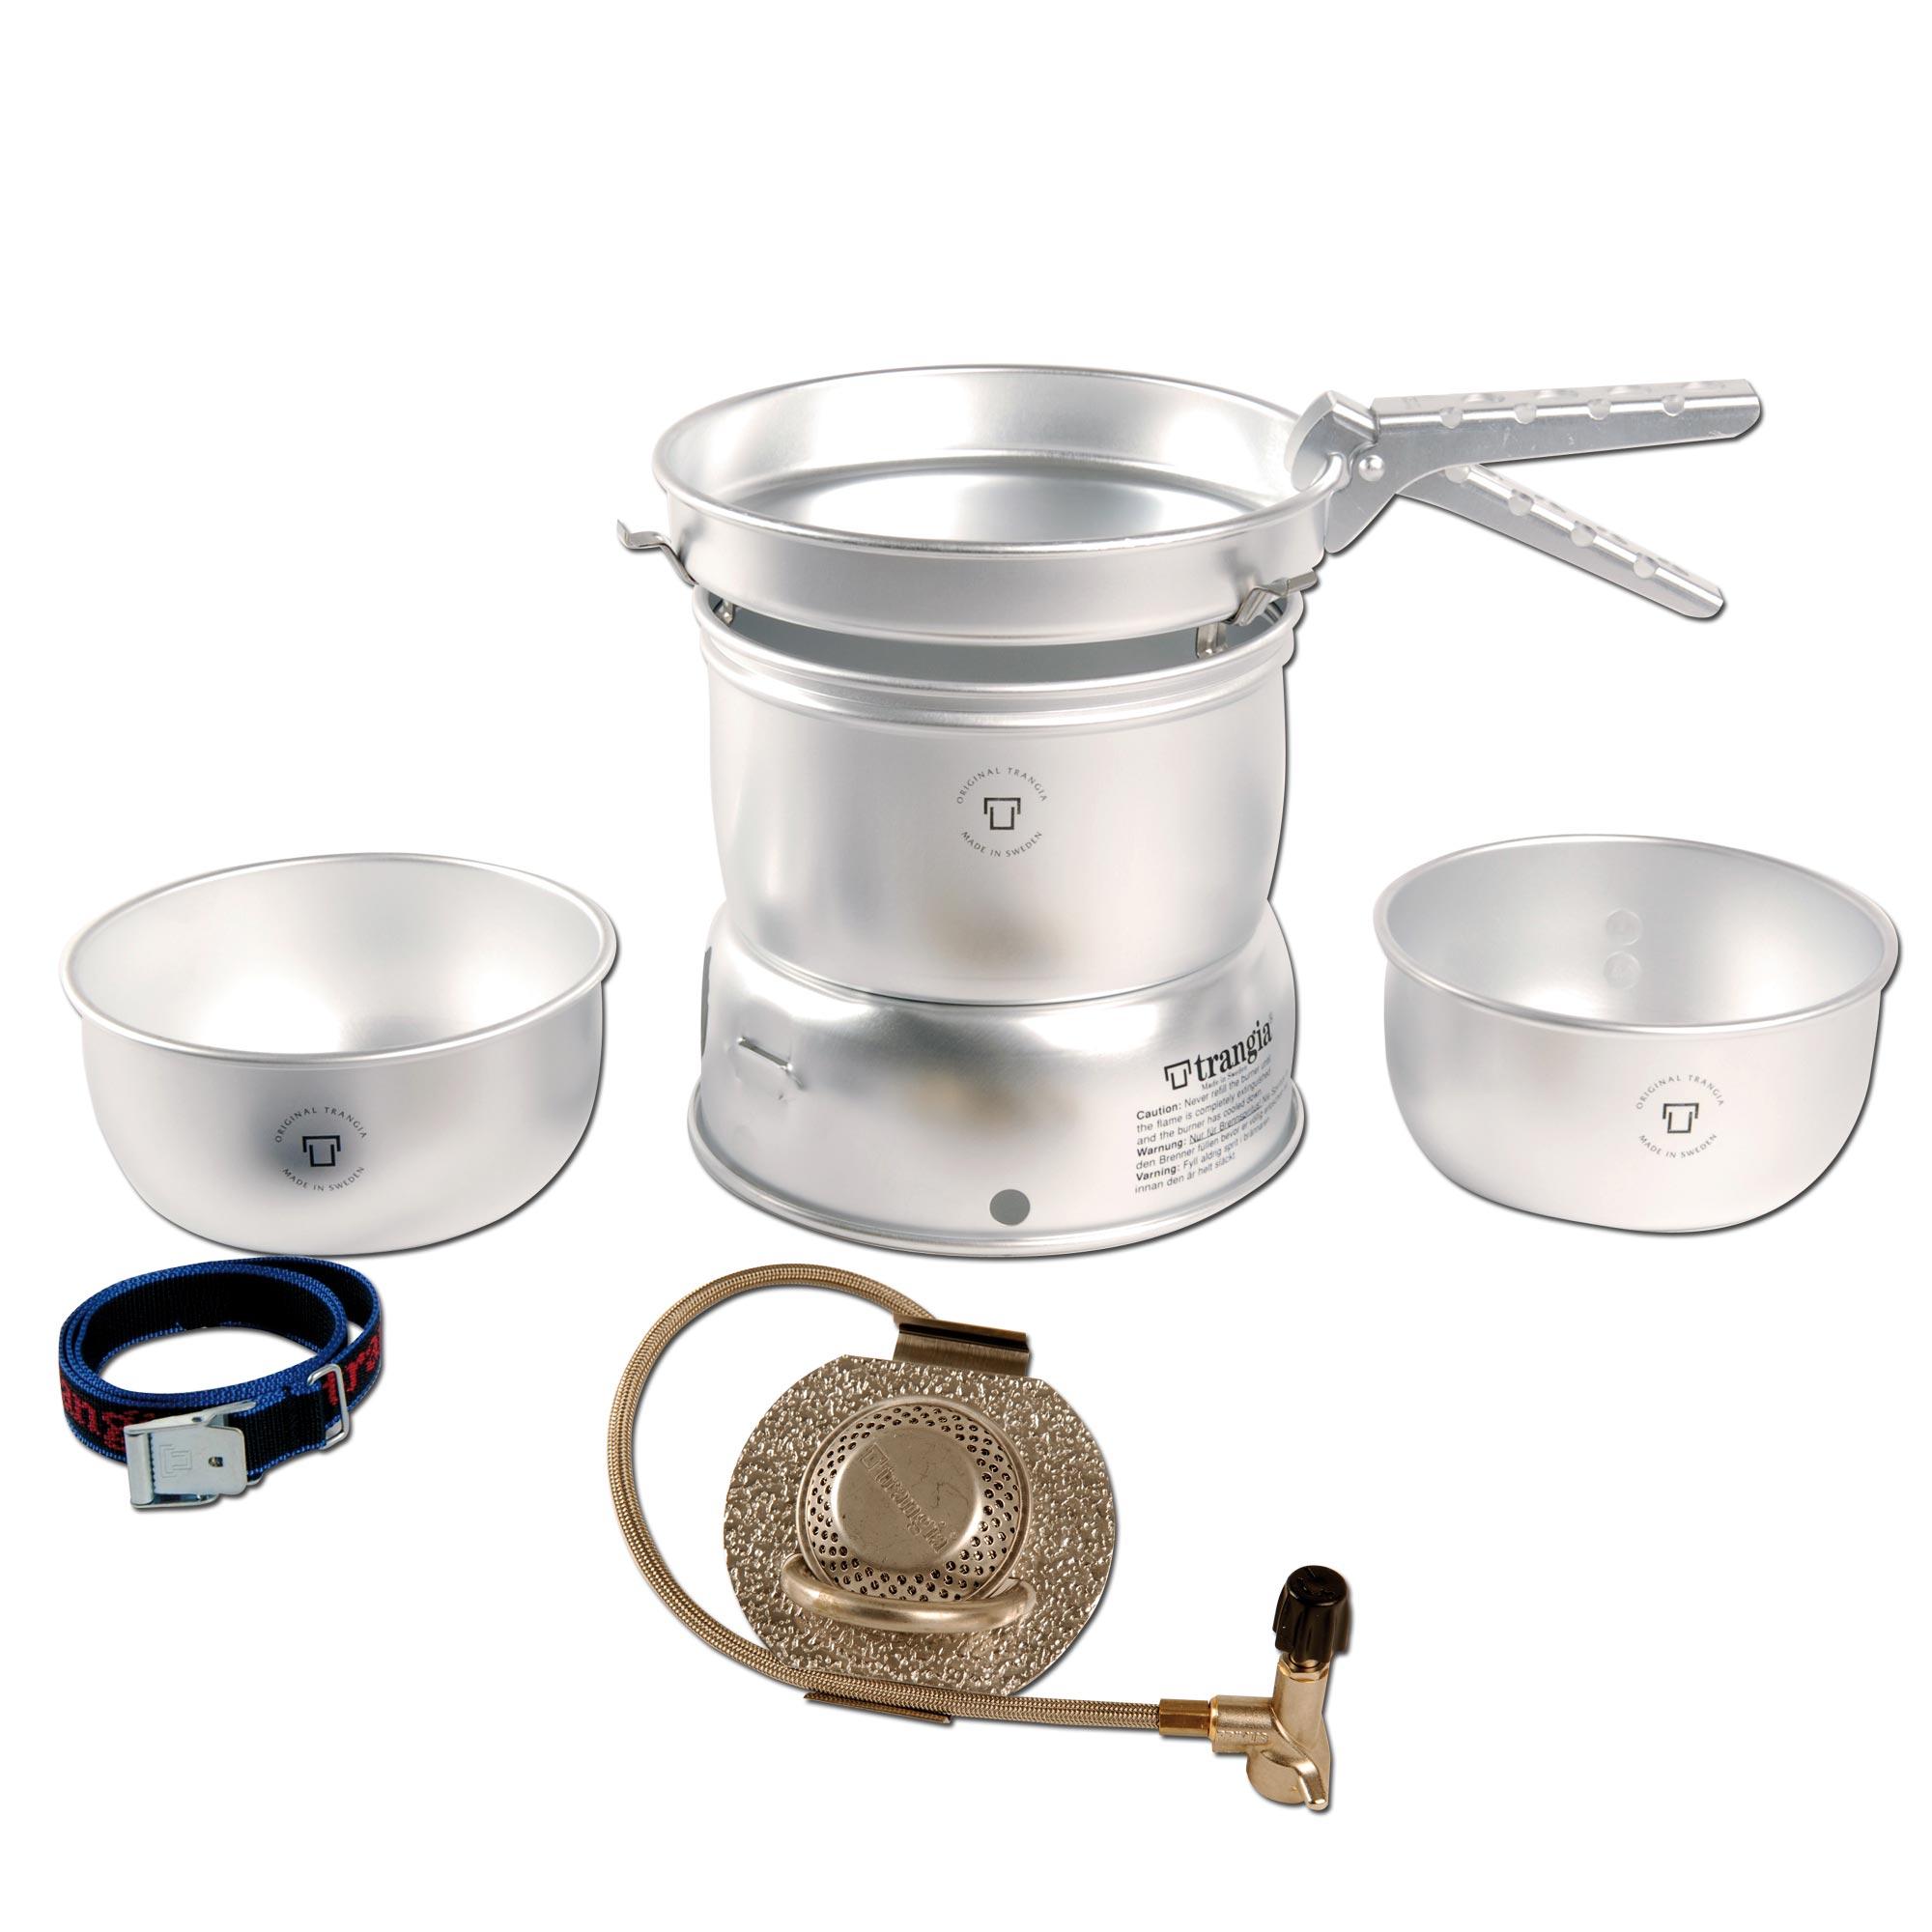 Cooker Trangia 25-1 UL (Gas)